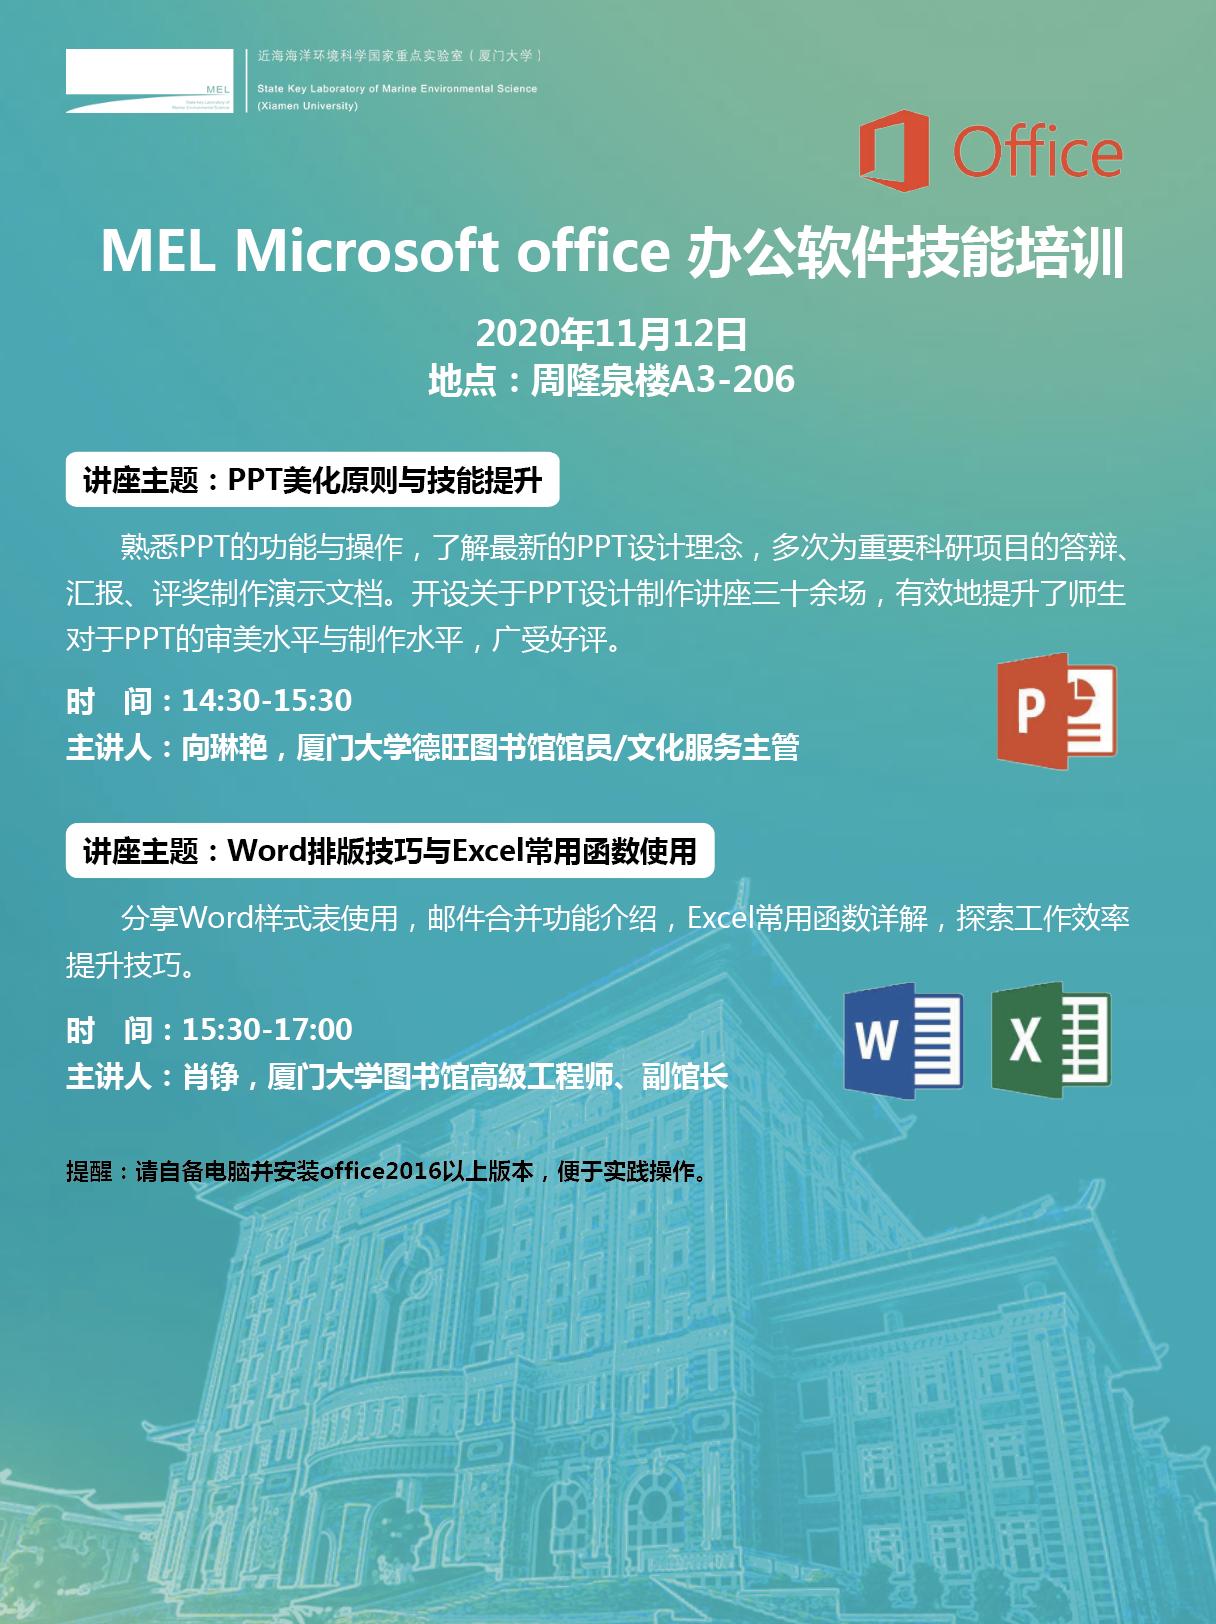 MEL举办Microsoft Office办公软件技能培训